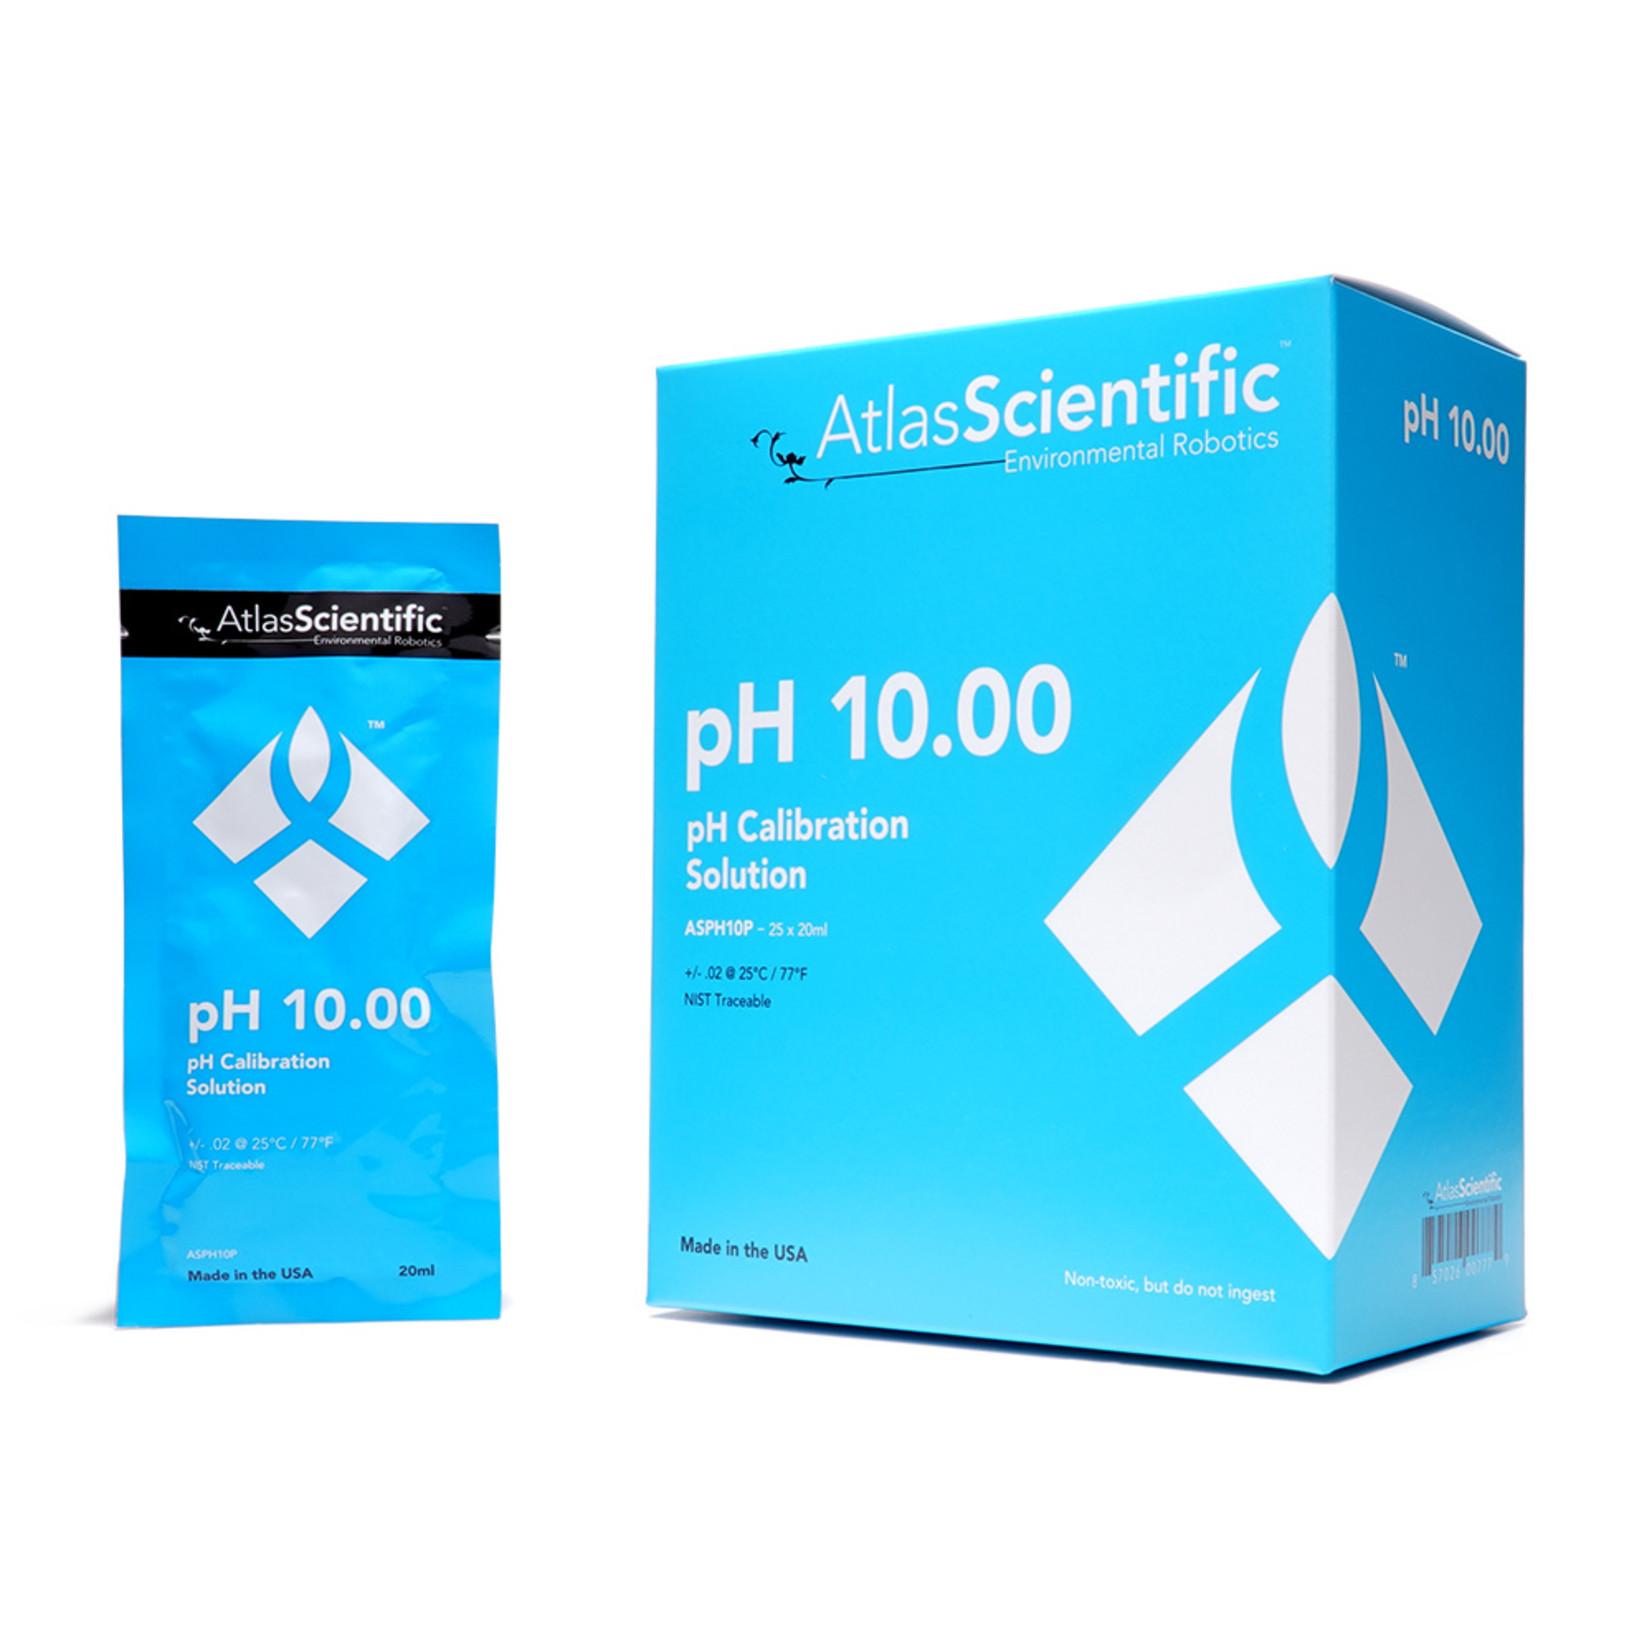 Atlas Scientific pH 10.00 Calibration Solution Pouches (Box of 25)